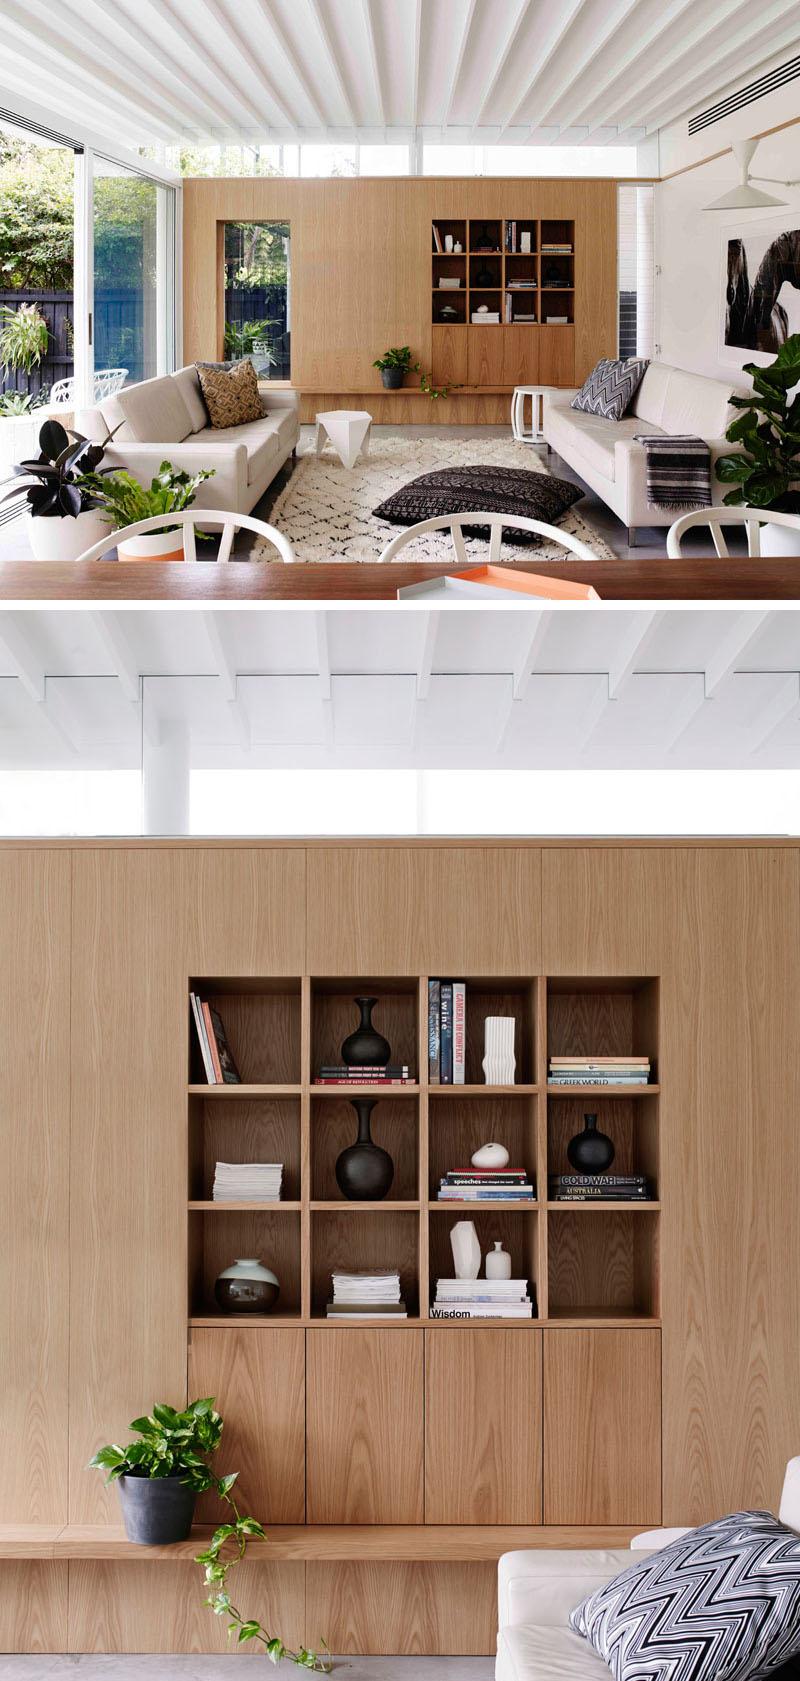 Living Room Built In Shelving 060217 1002 05 Contemporist